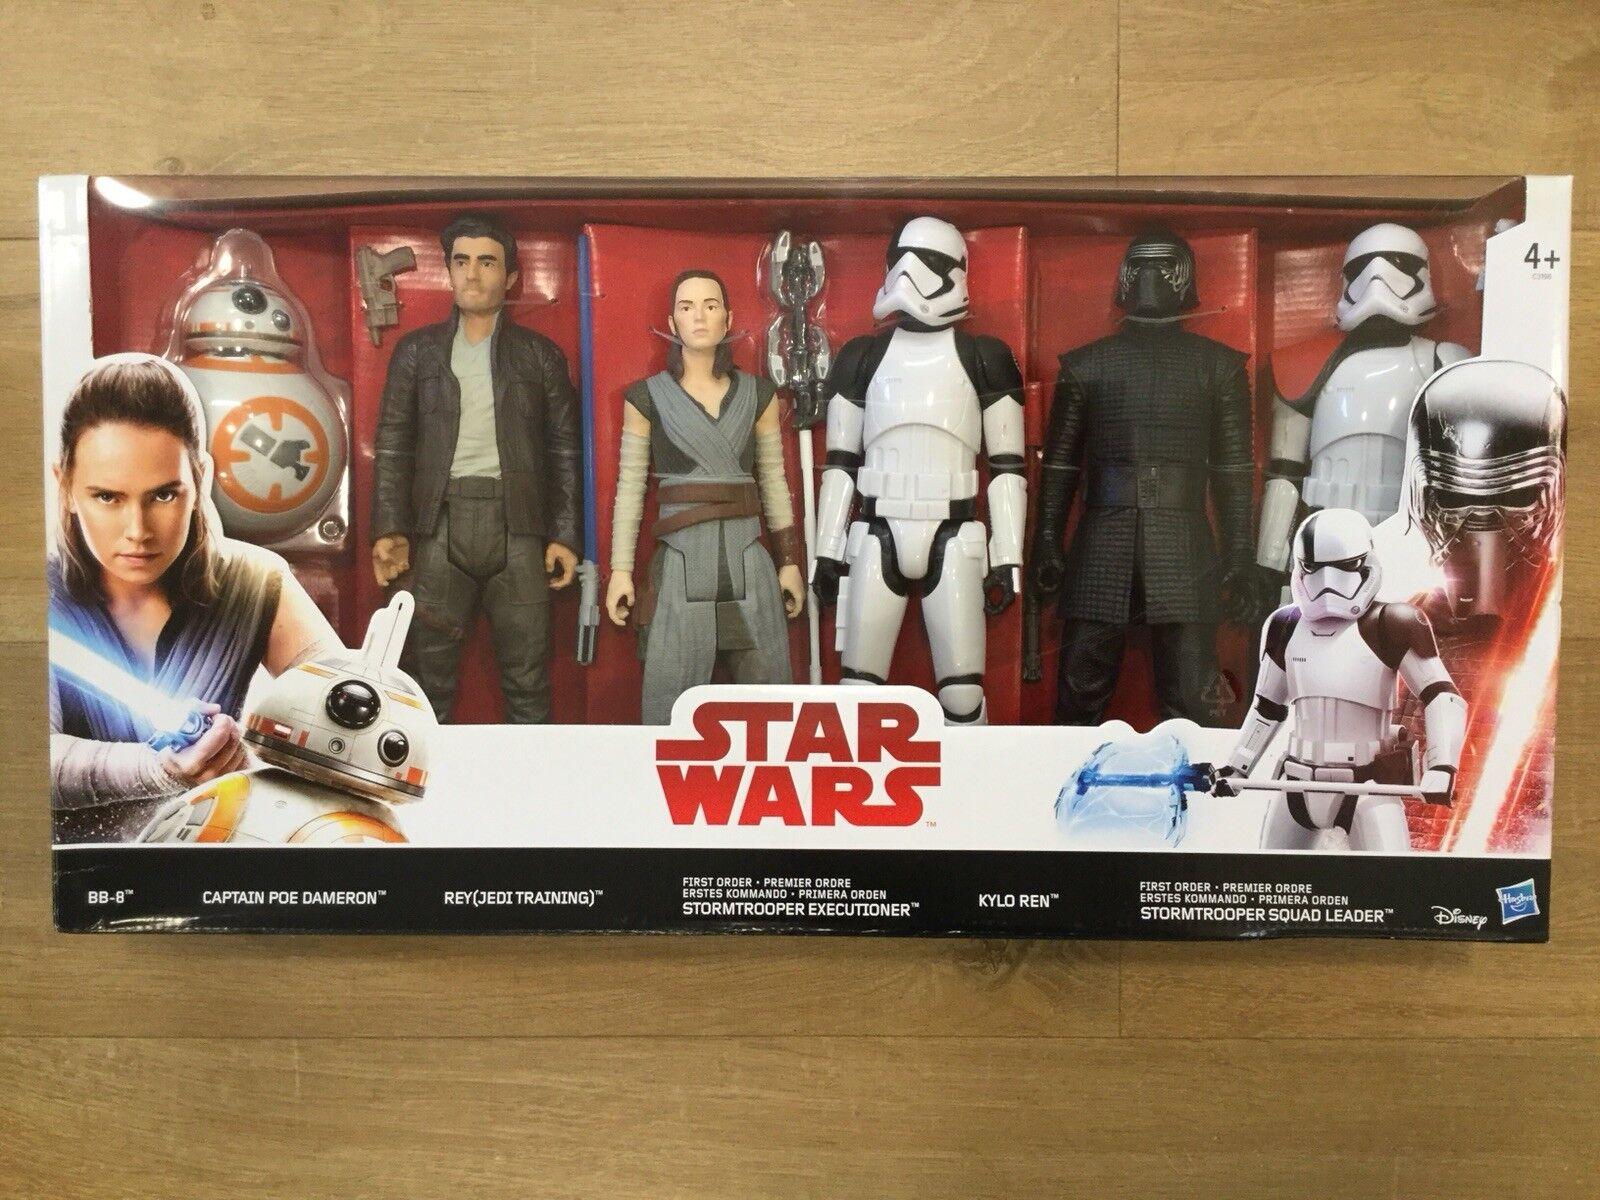 NEW Star Wars Last Jedi 6 Pack of Heroes Action Figures (Hasbro C3198)